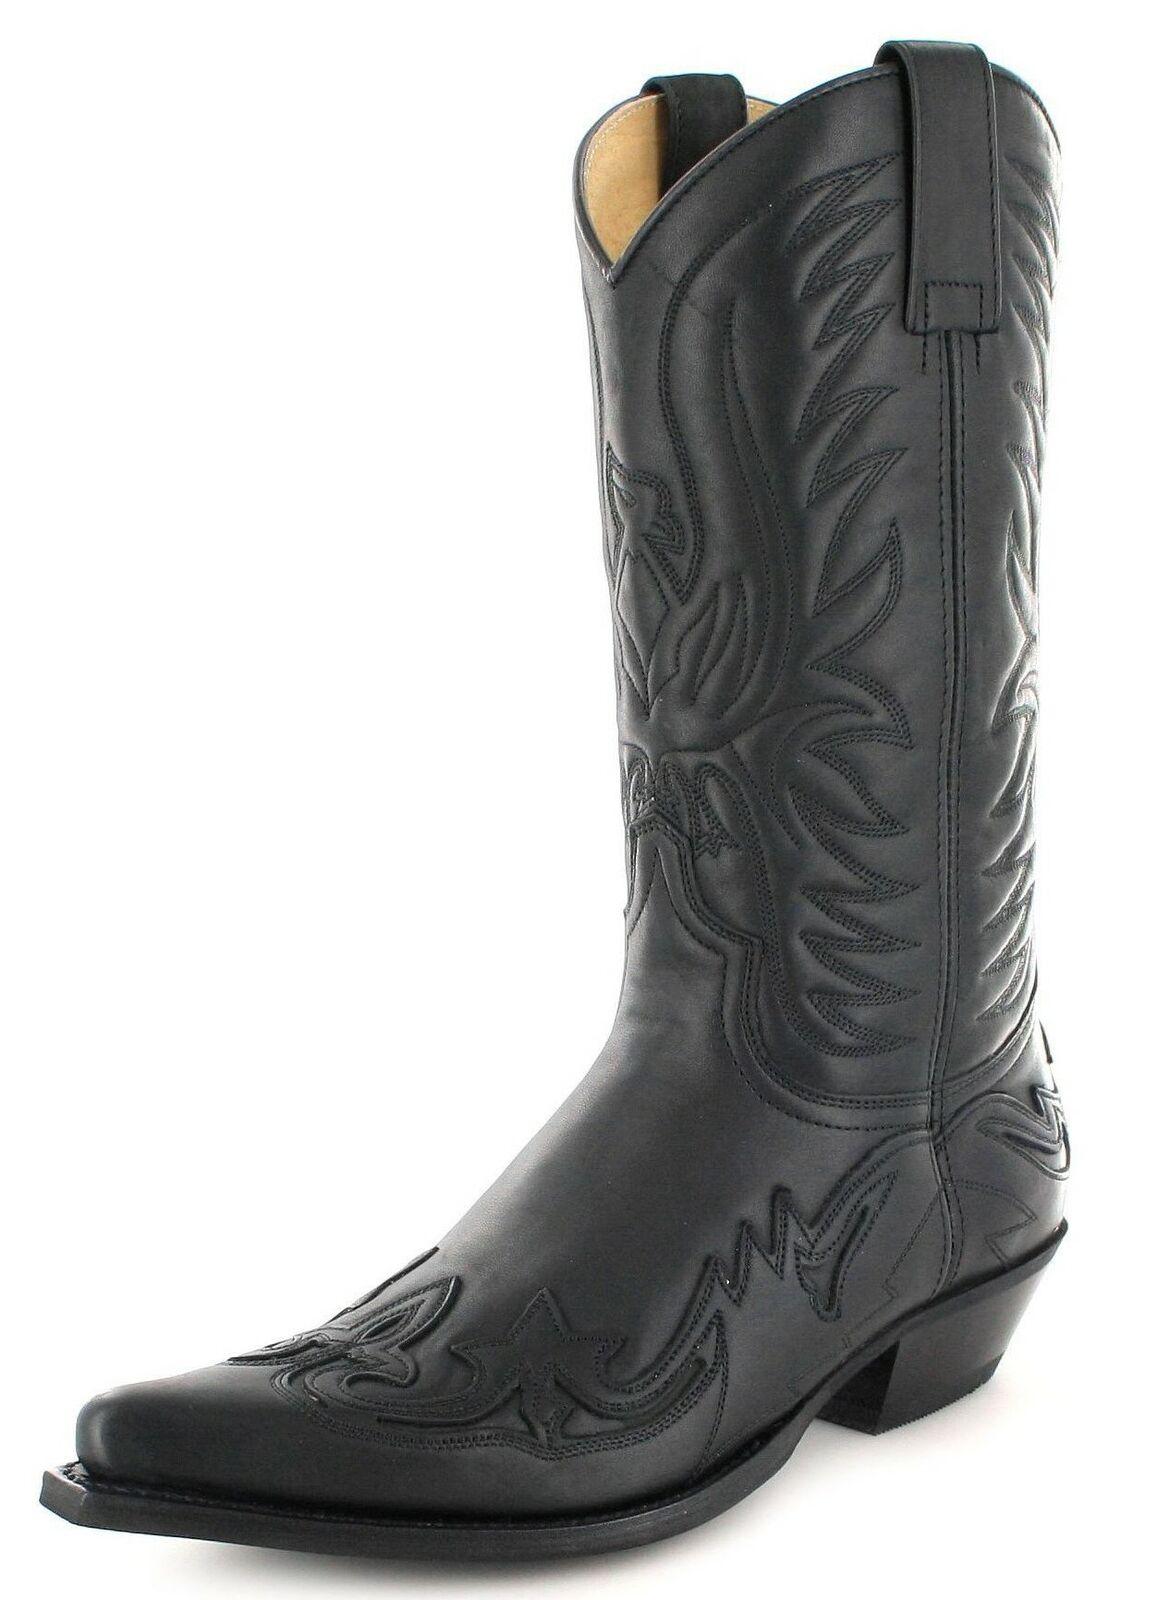 Fashion Boots Stiefel BU1005 black Westernstiefel Cowboystiefel